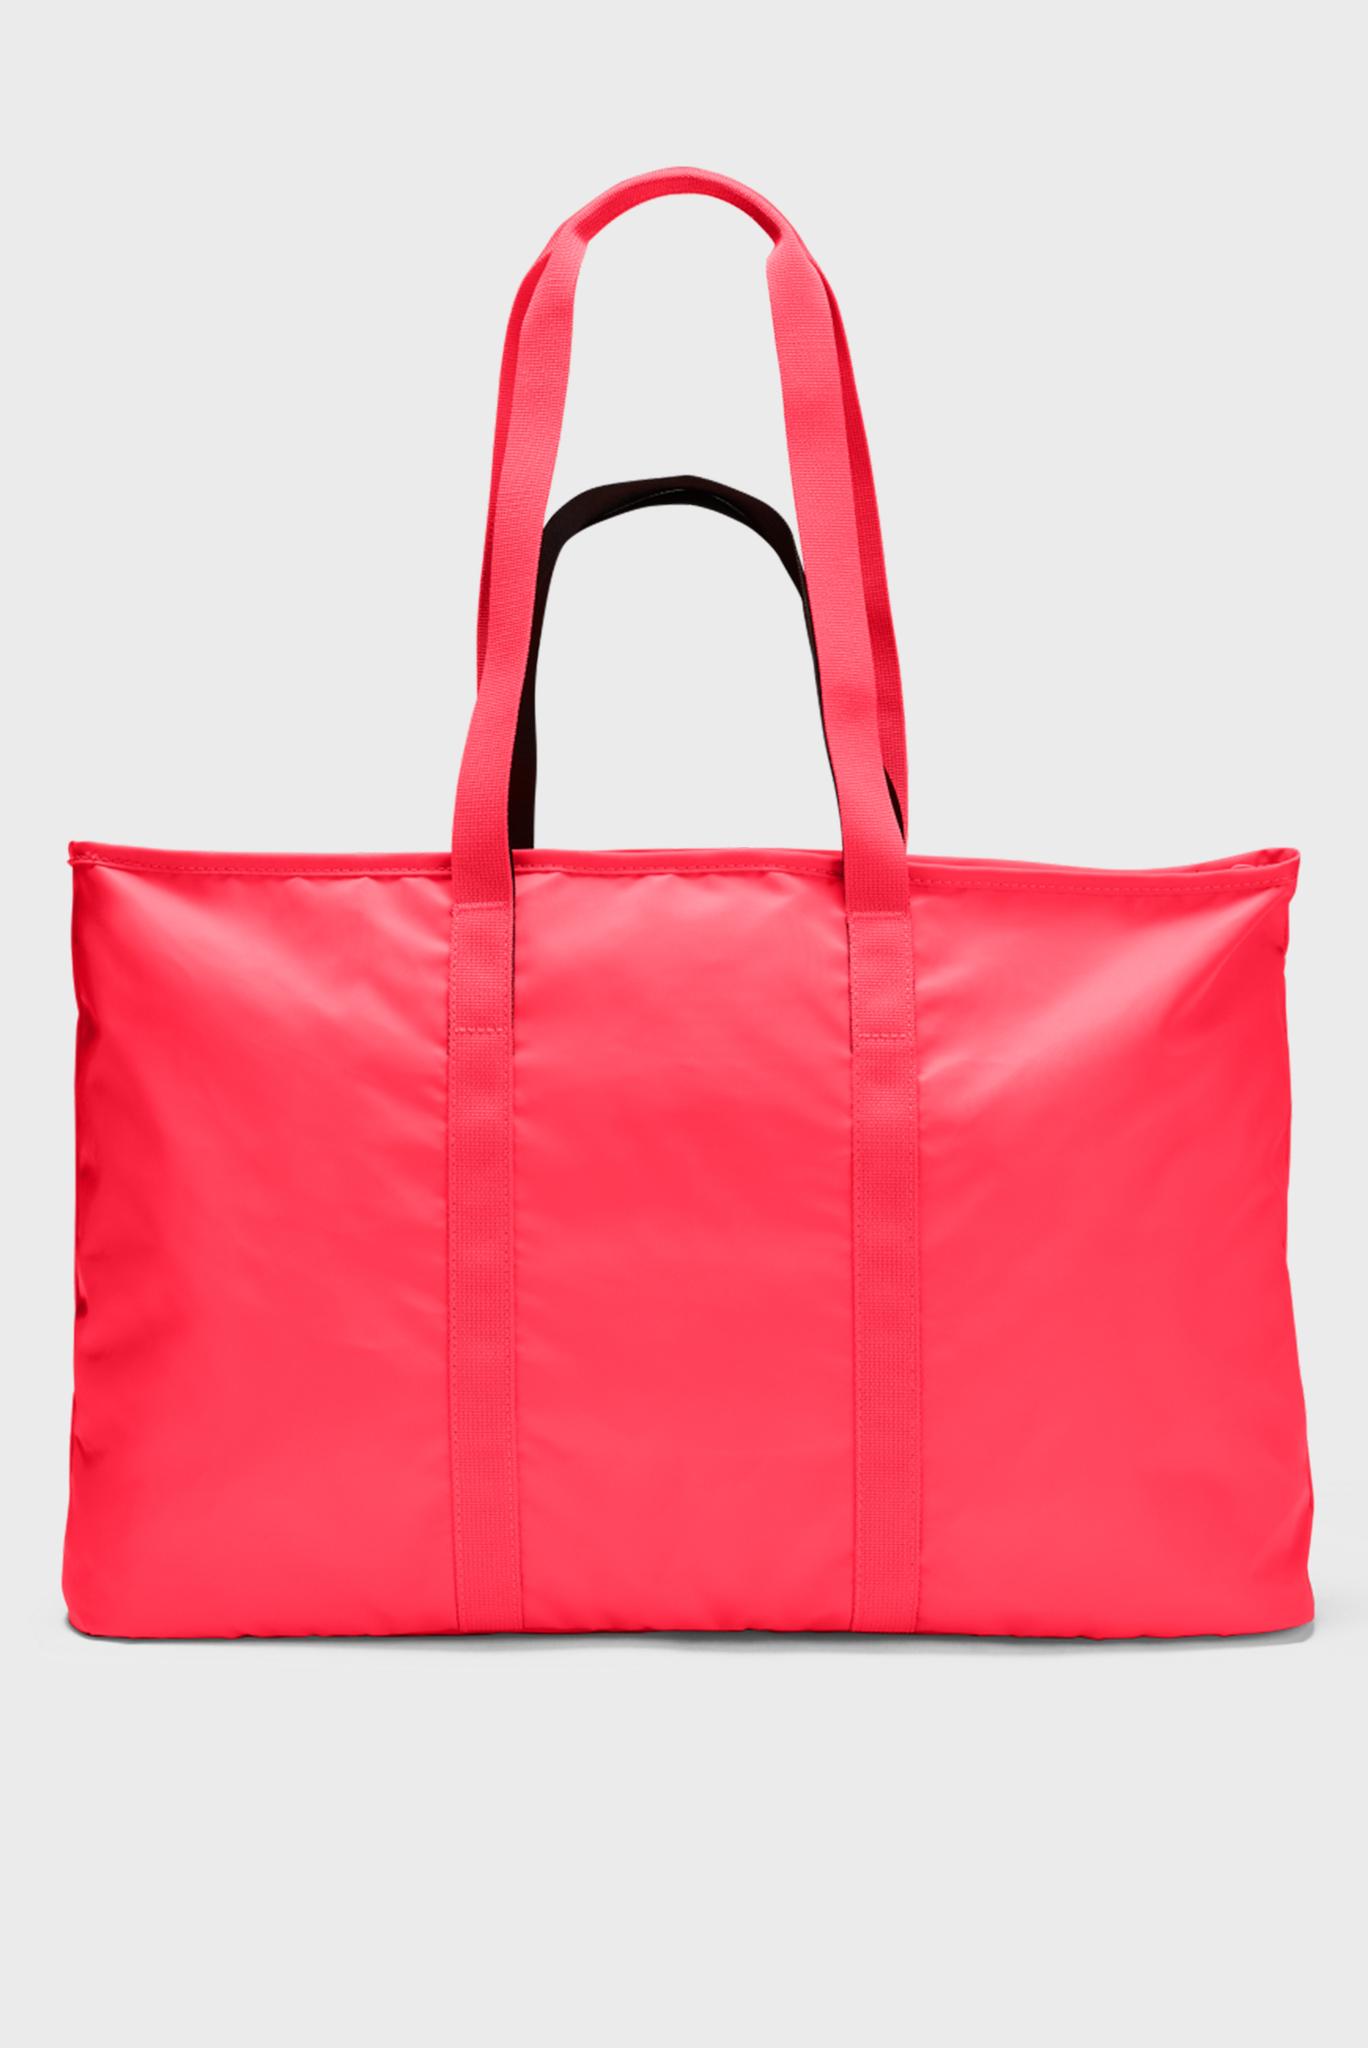 Женская красная спортивная сумка Women's Metallic Favorite Tote 2.0 Under Armour